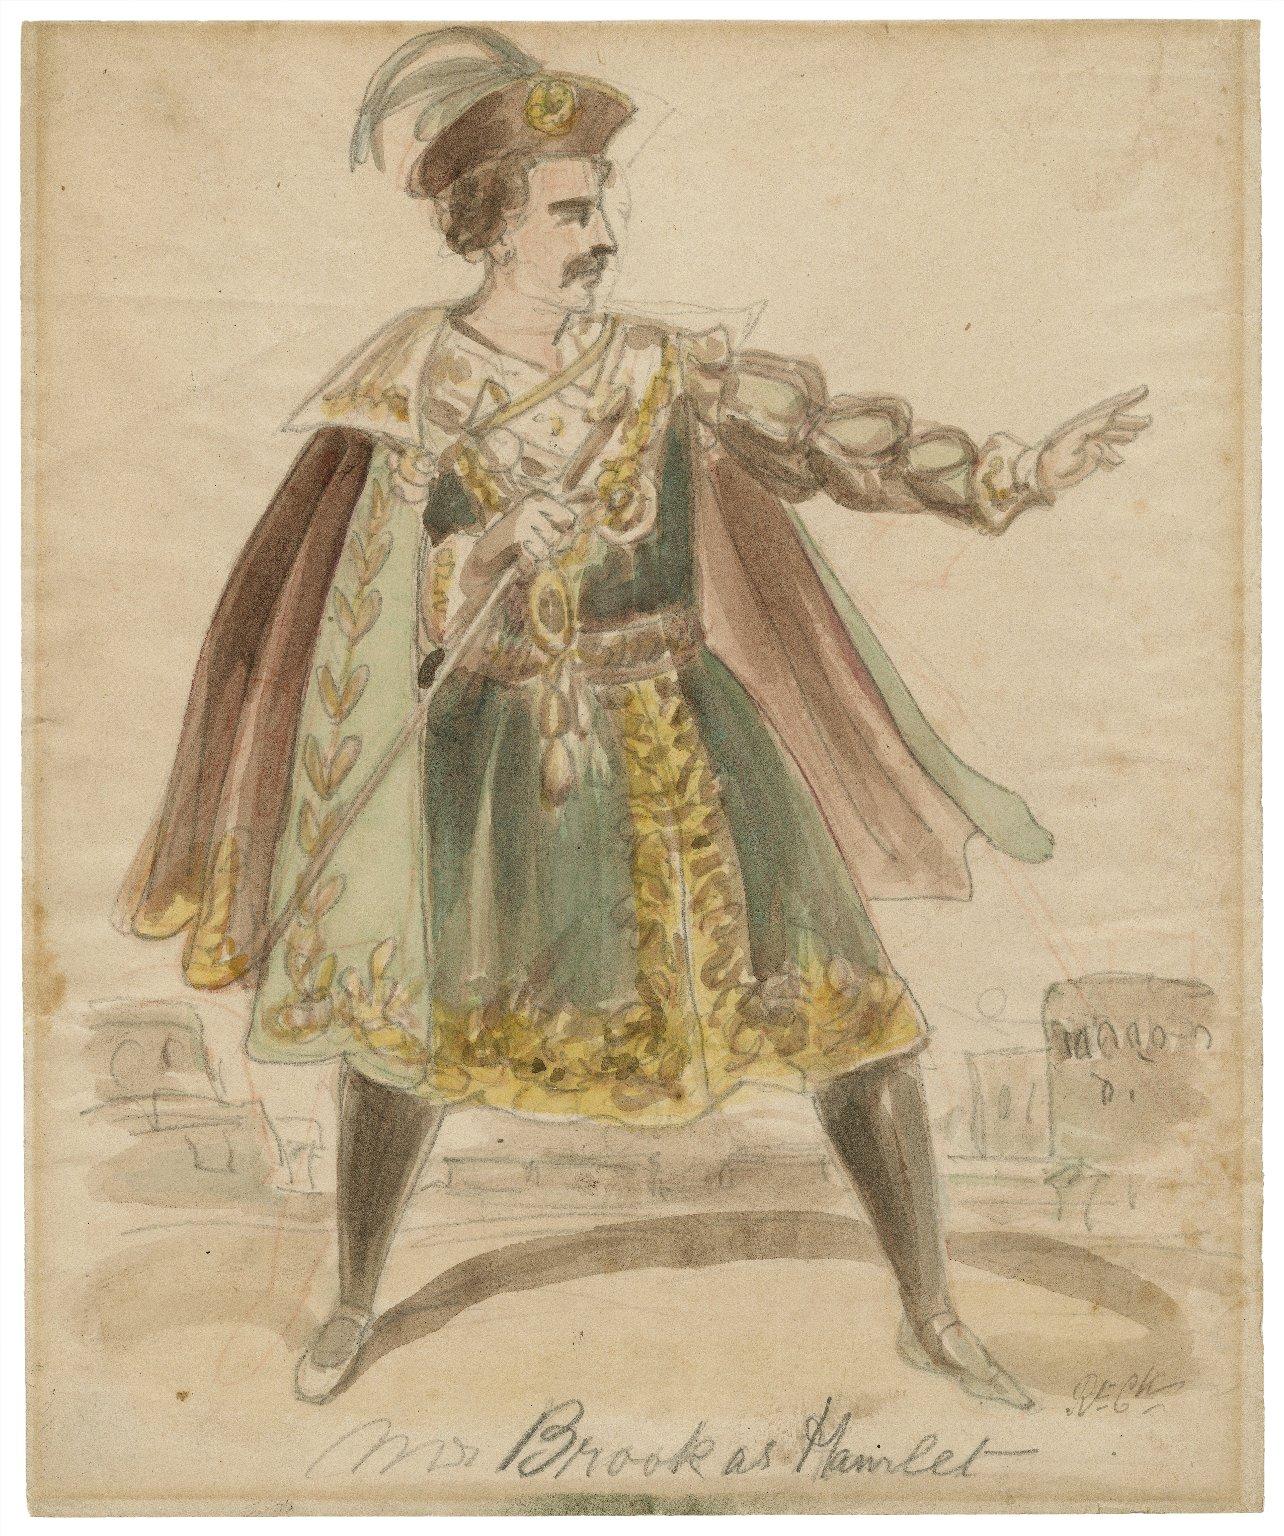 Mr. Brook [sic] as Hamlet [graphic] / [Issac Robert Cruikshank, probable artist].